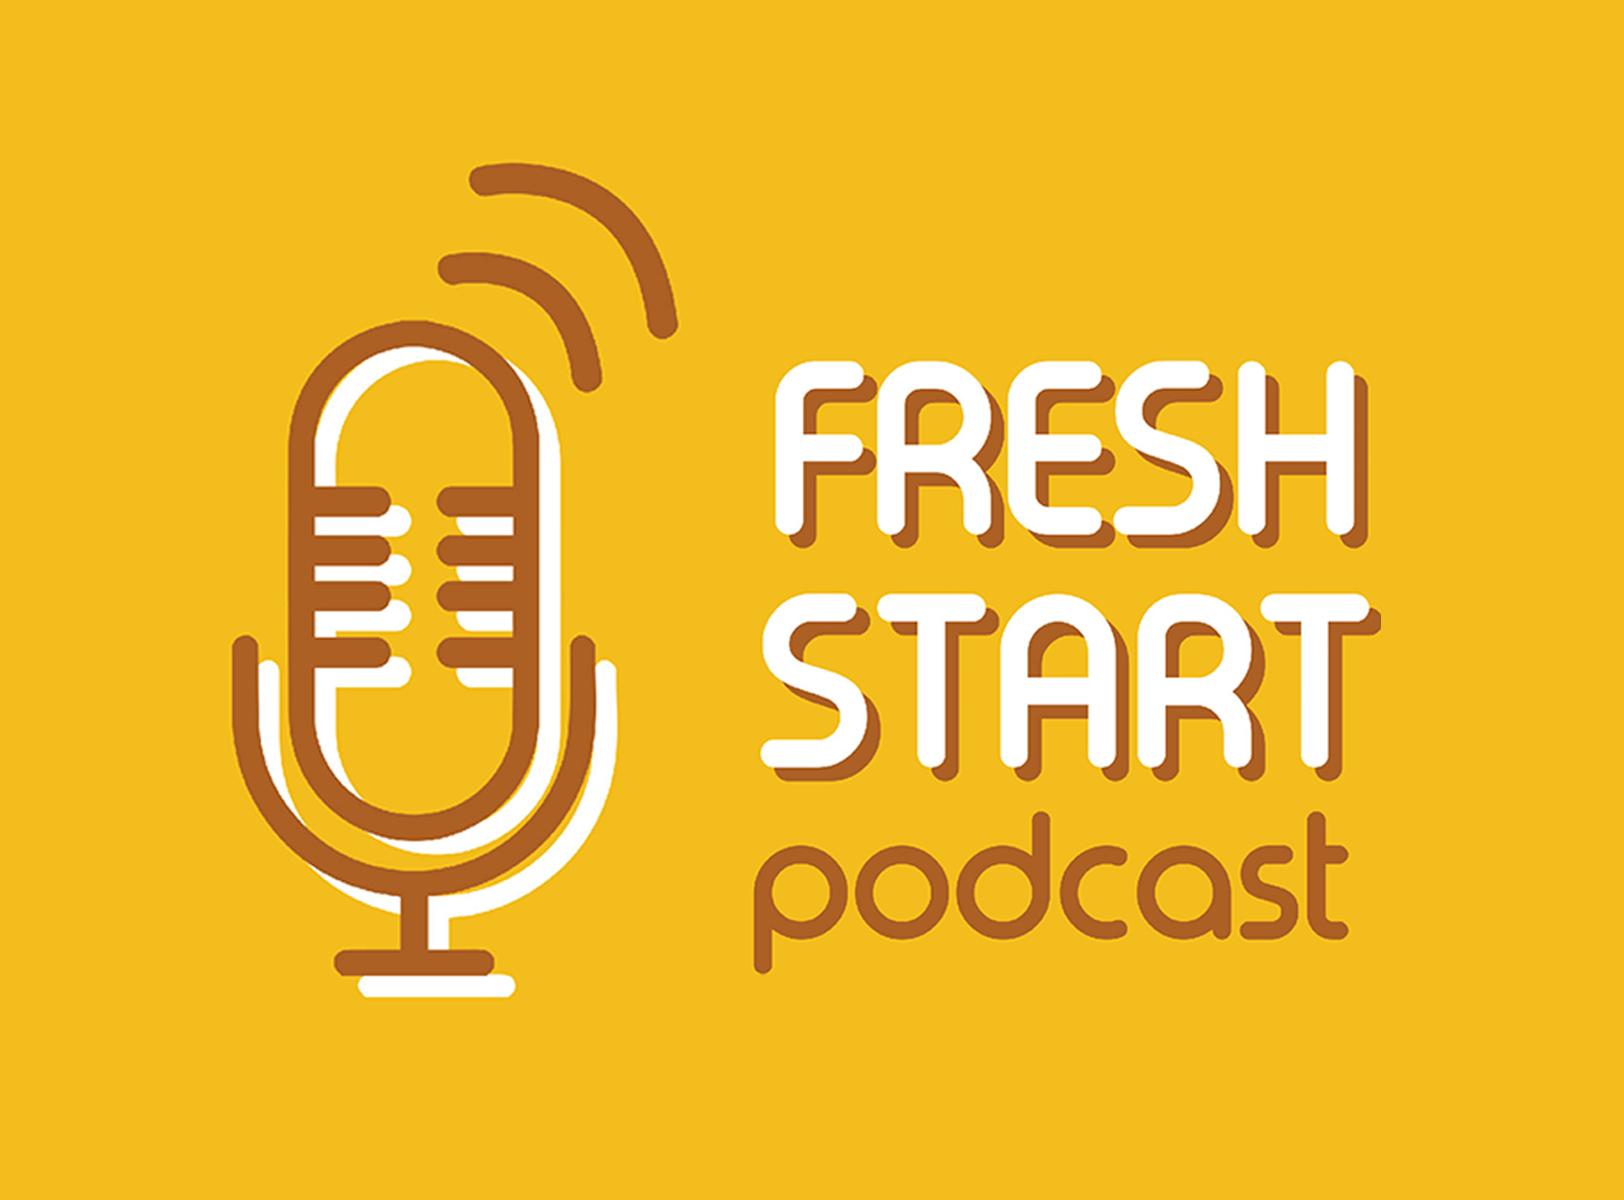 Fresh Start: Podcast News (7/3/2019 Wed.)